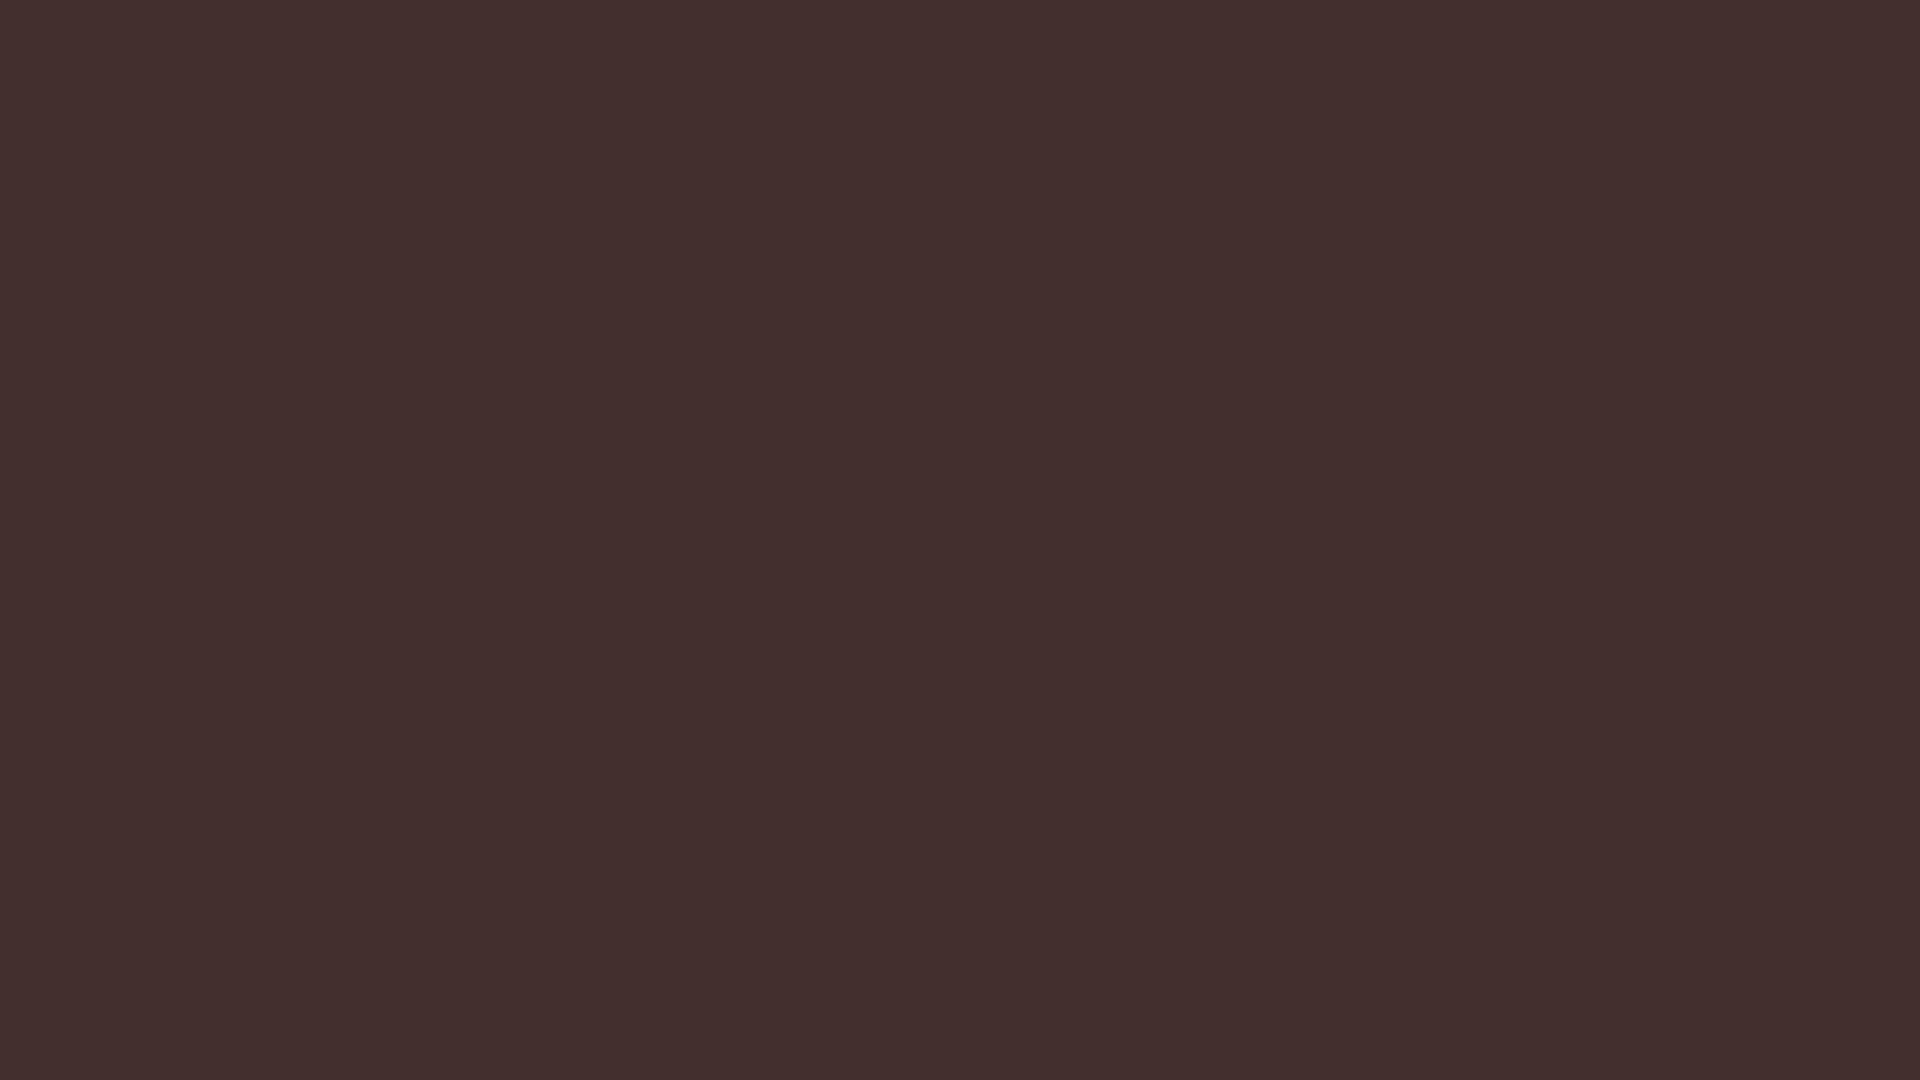 1920x1080 Old Burgundy Solid Color Background